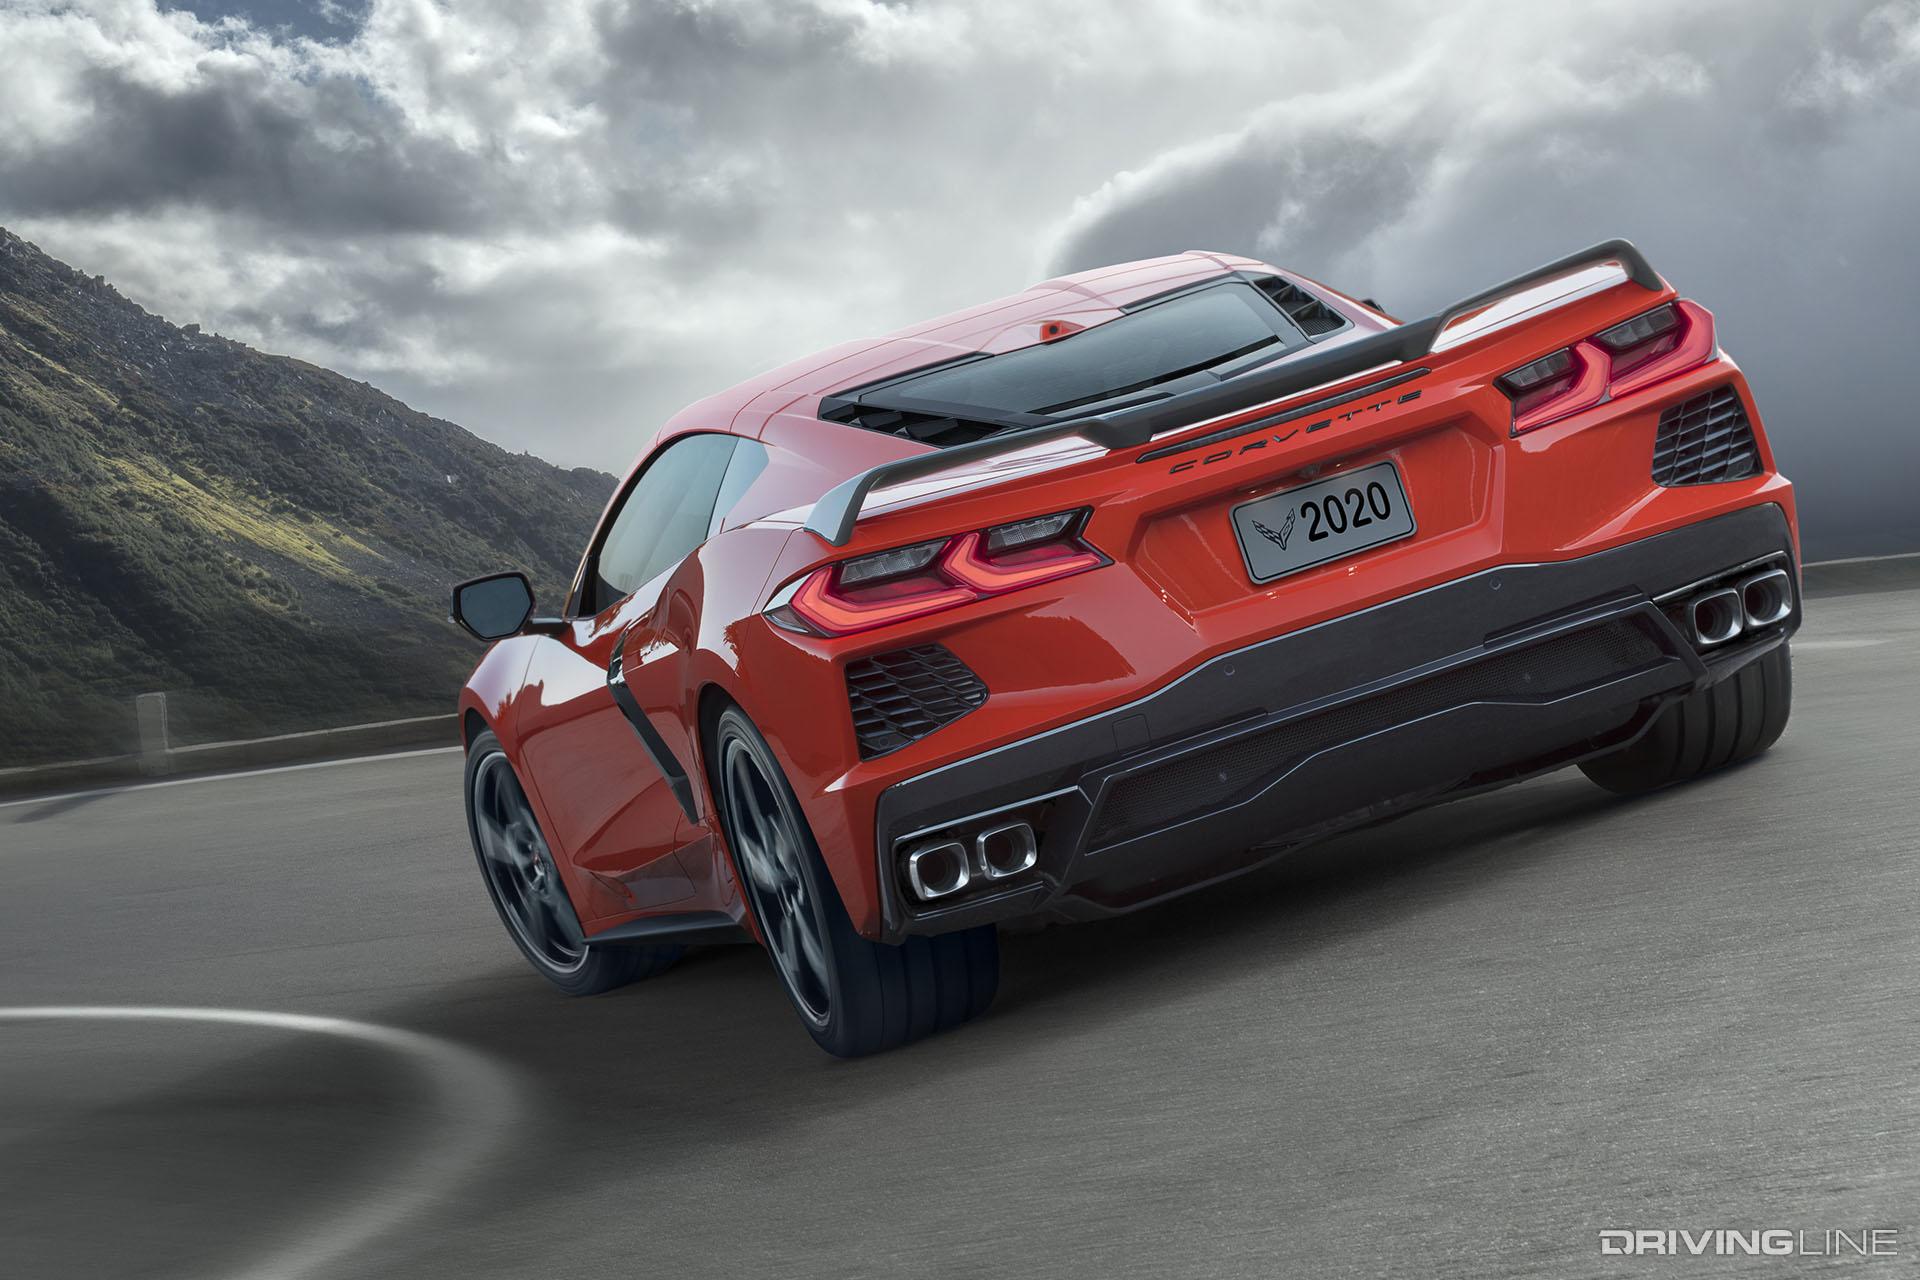 Vette Revolution: The Tech of the 2020 C8 Corvette | DrivingLine